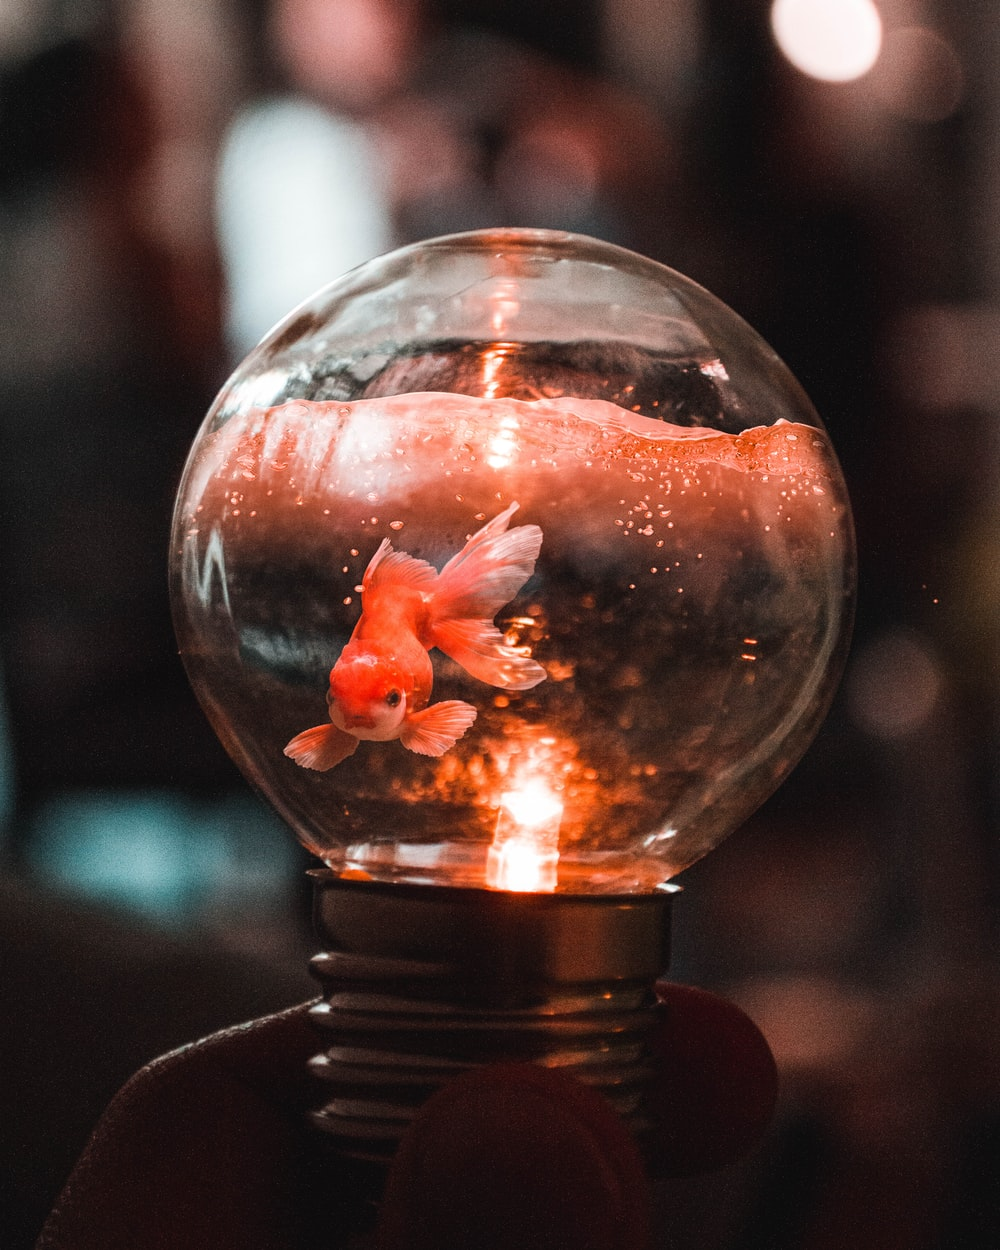 goldfish in glass bowl